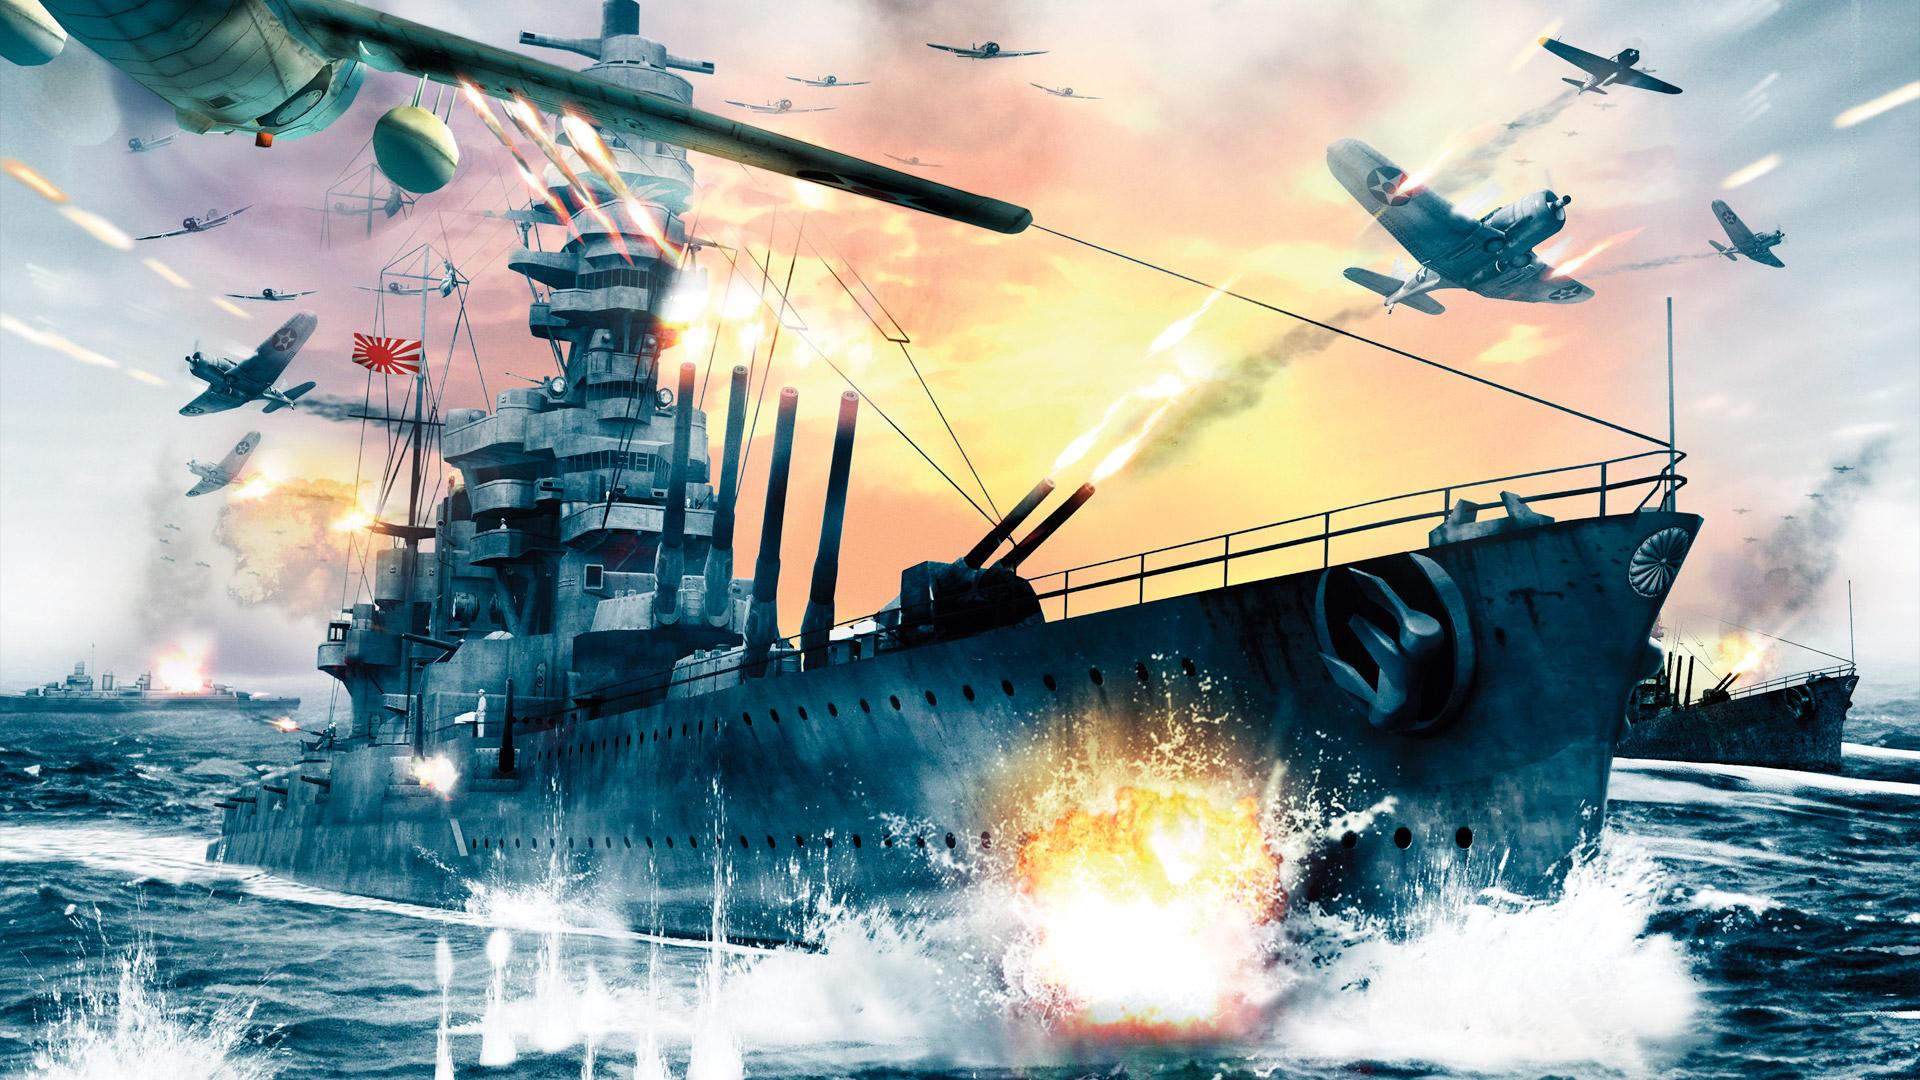 Battlestations: Midway Wallpaper in 1920x1080